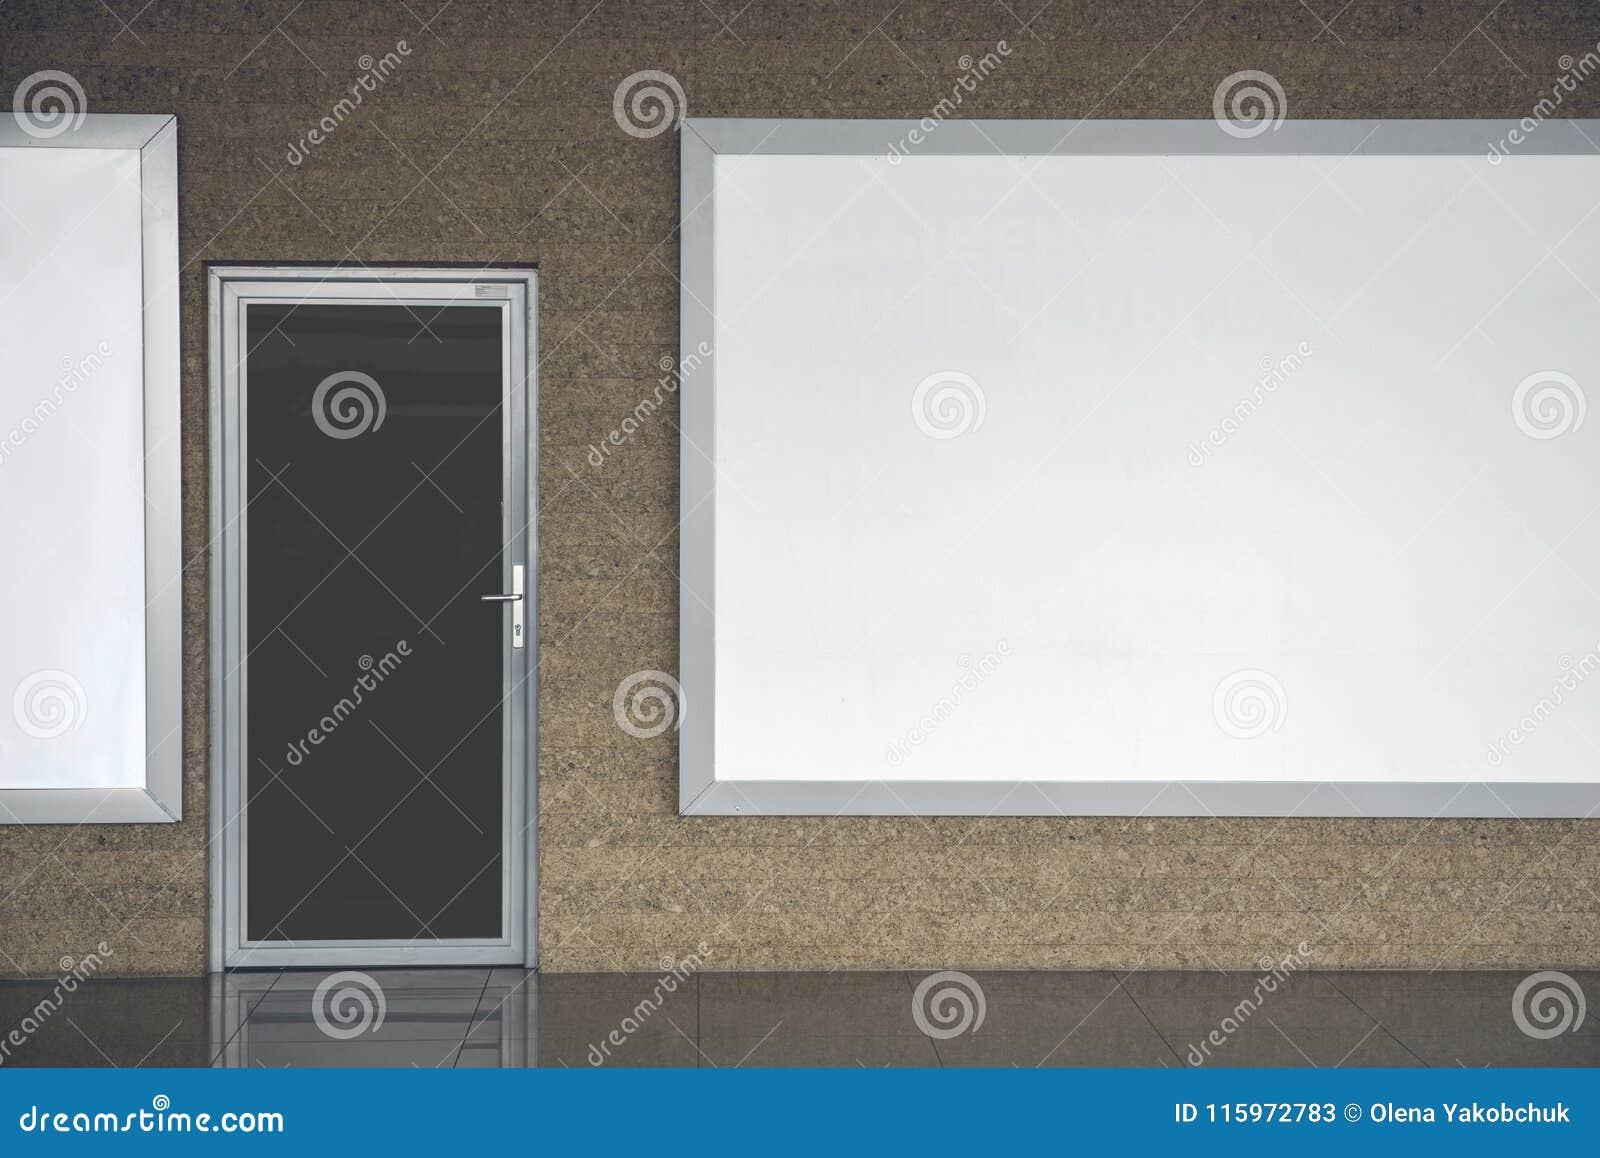 Silver Door Locating Near Big Board Stock Image - Image of company ...